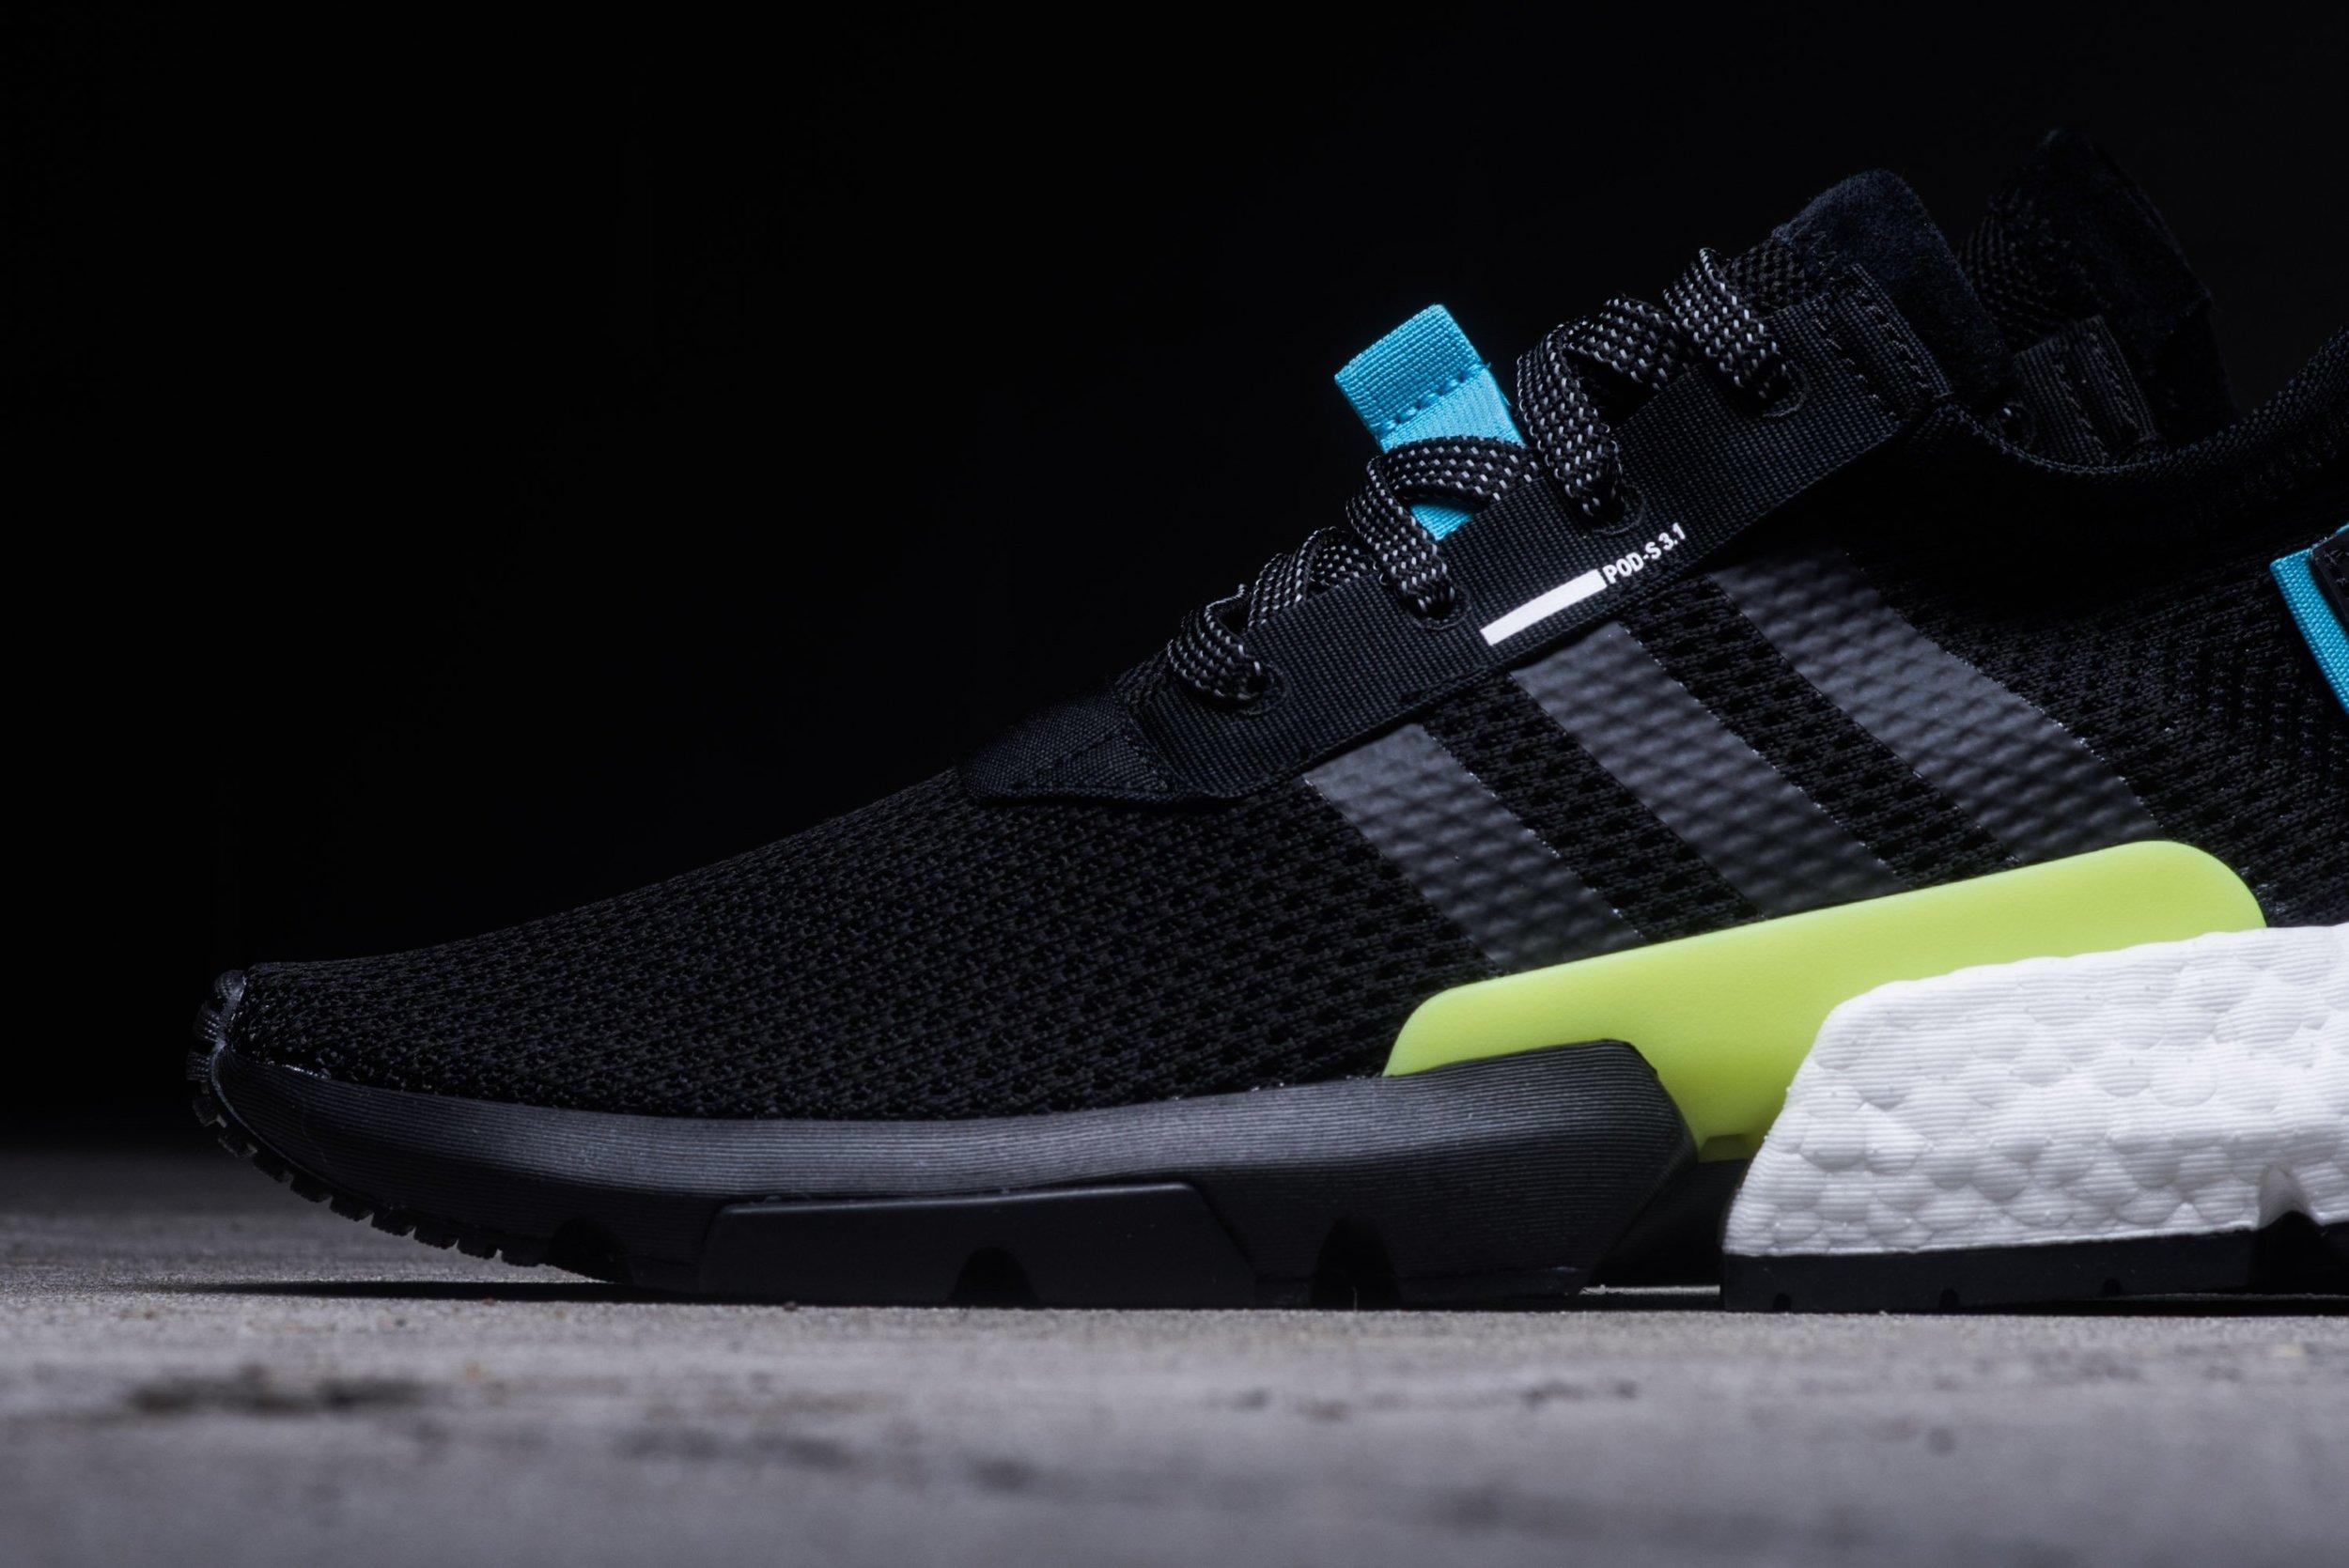 Adidas_POD-S3.1_aq1059_black_white_sneaker_politics_5.jpg